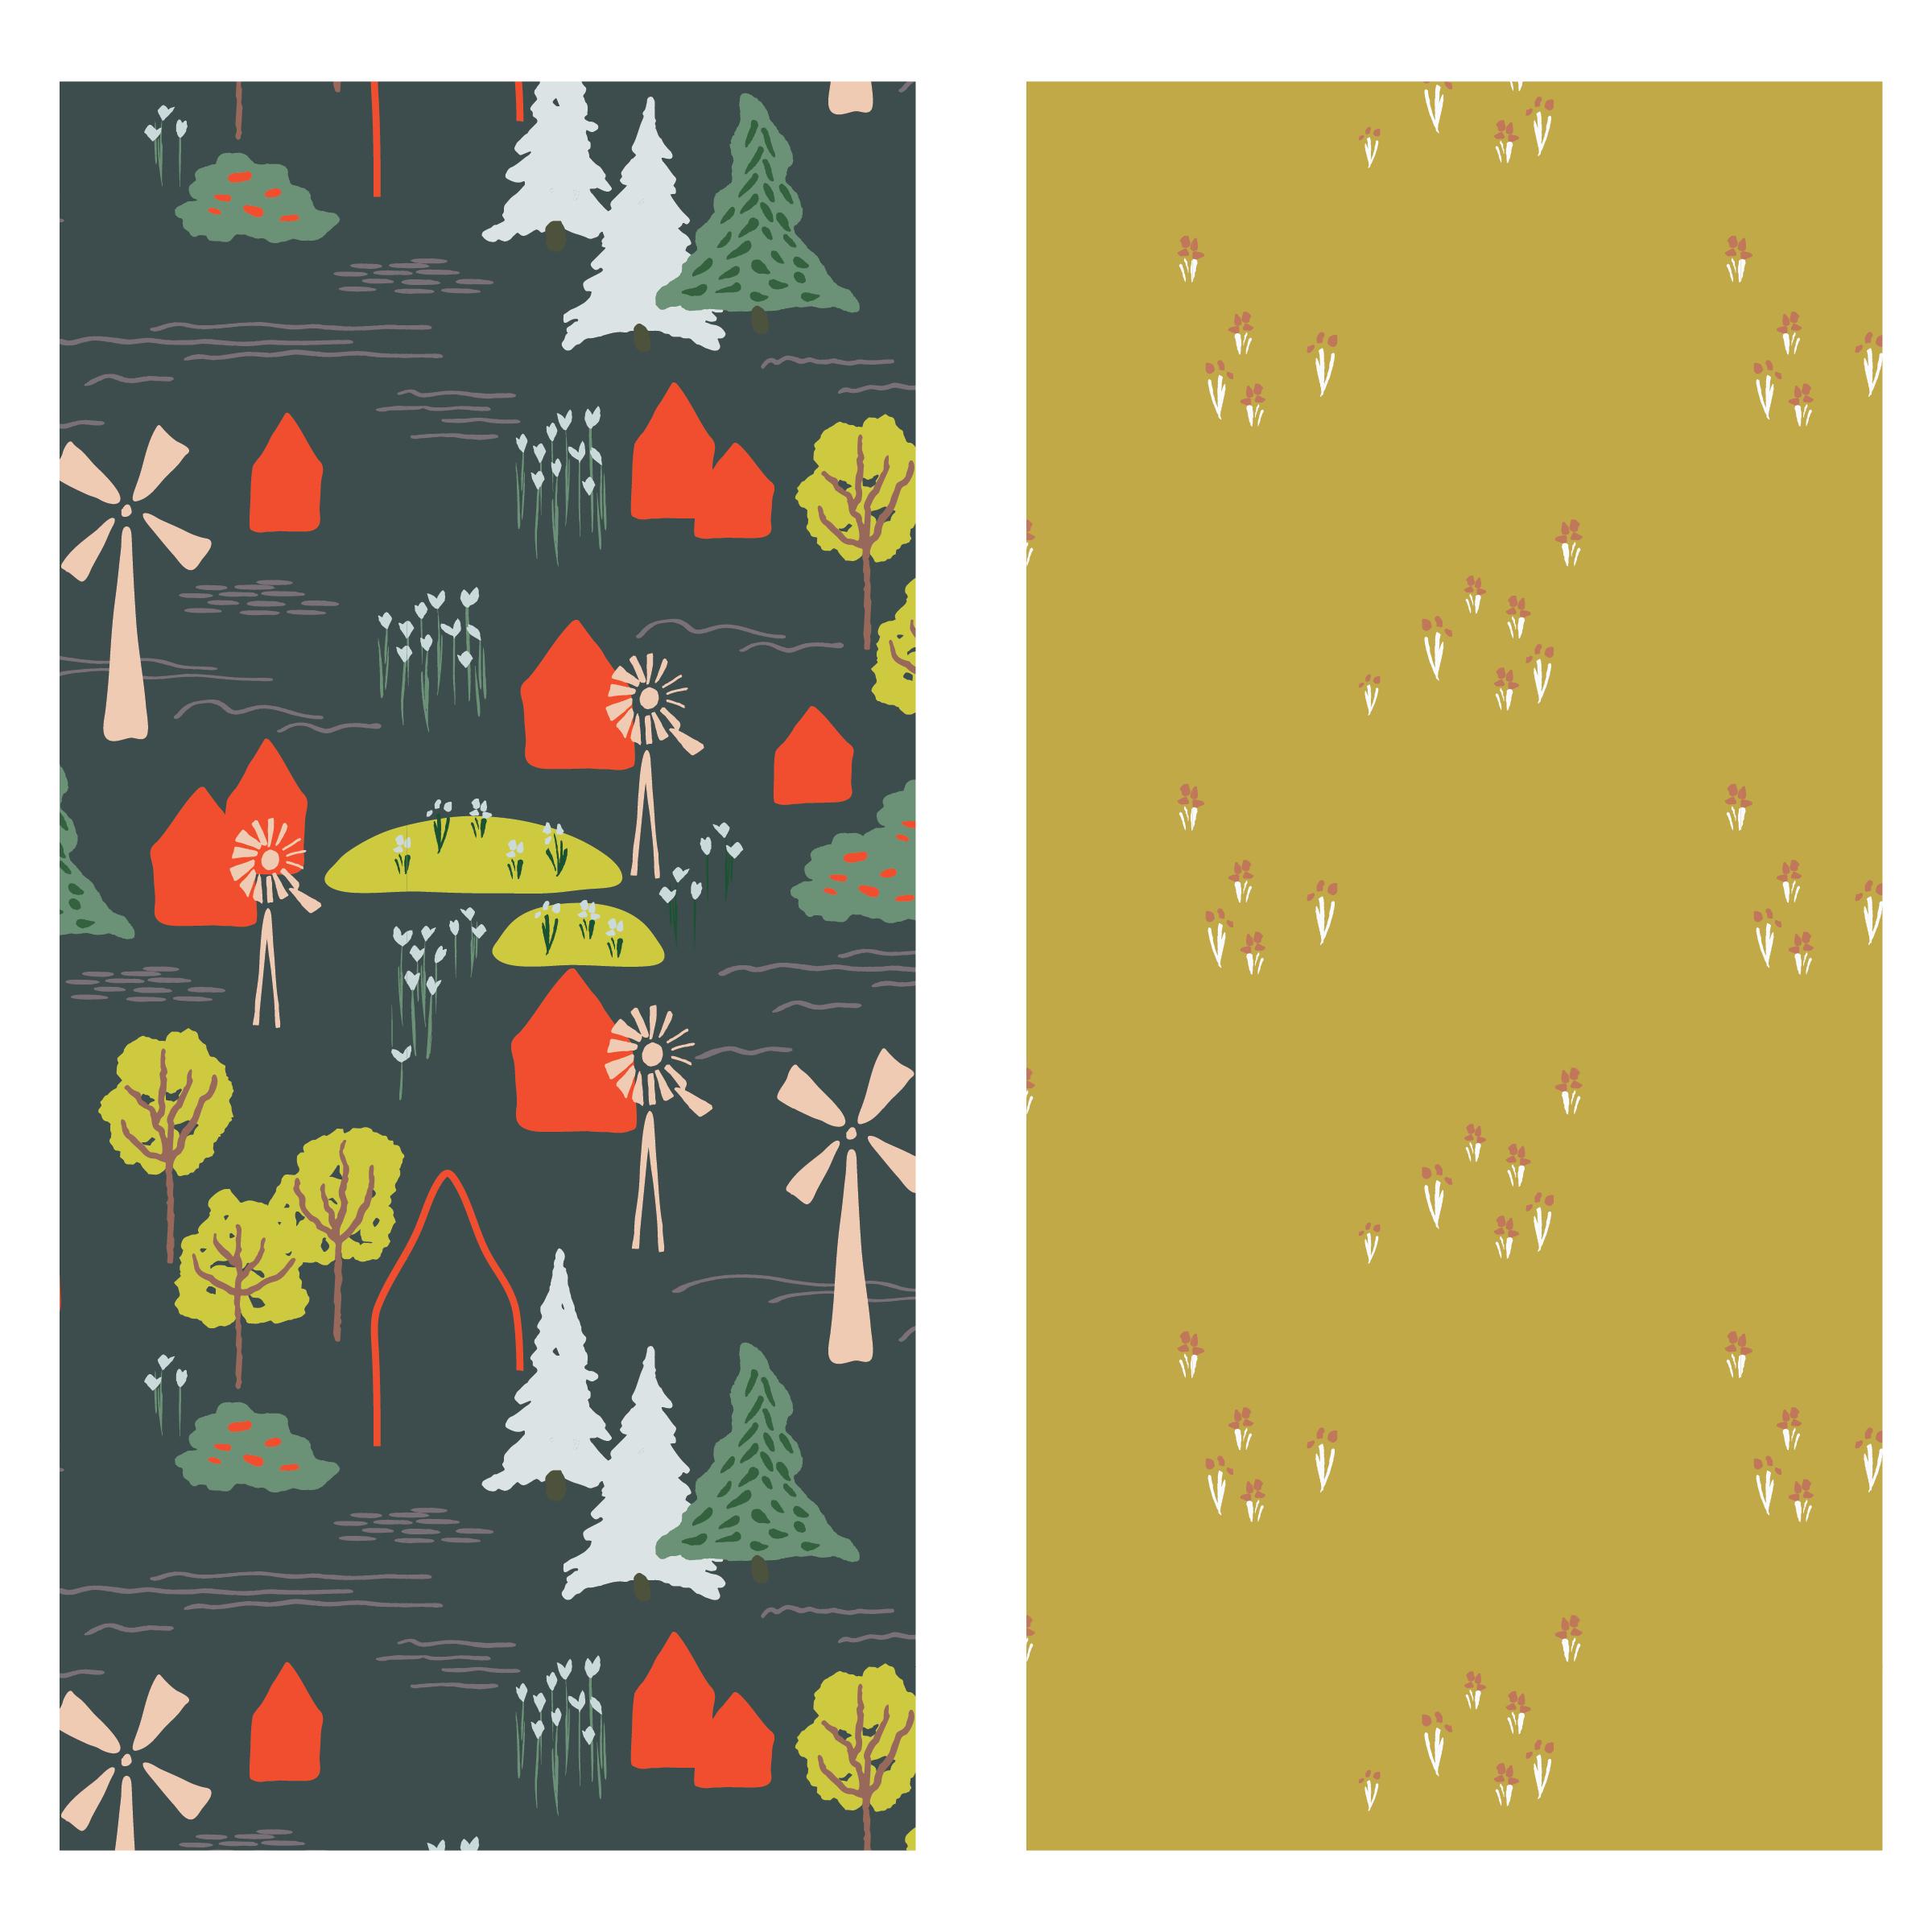 by HOPE johnson surface pattern design_pattern pair163.jpg